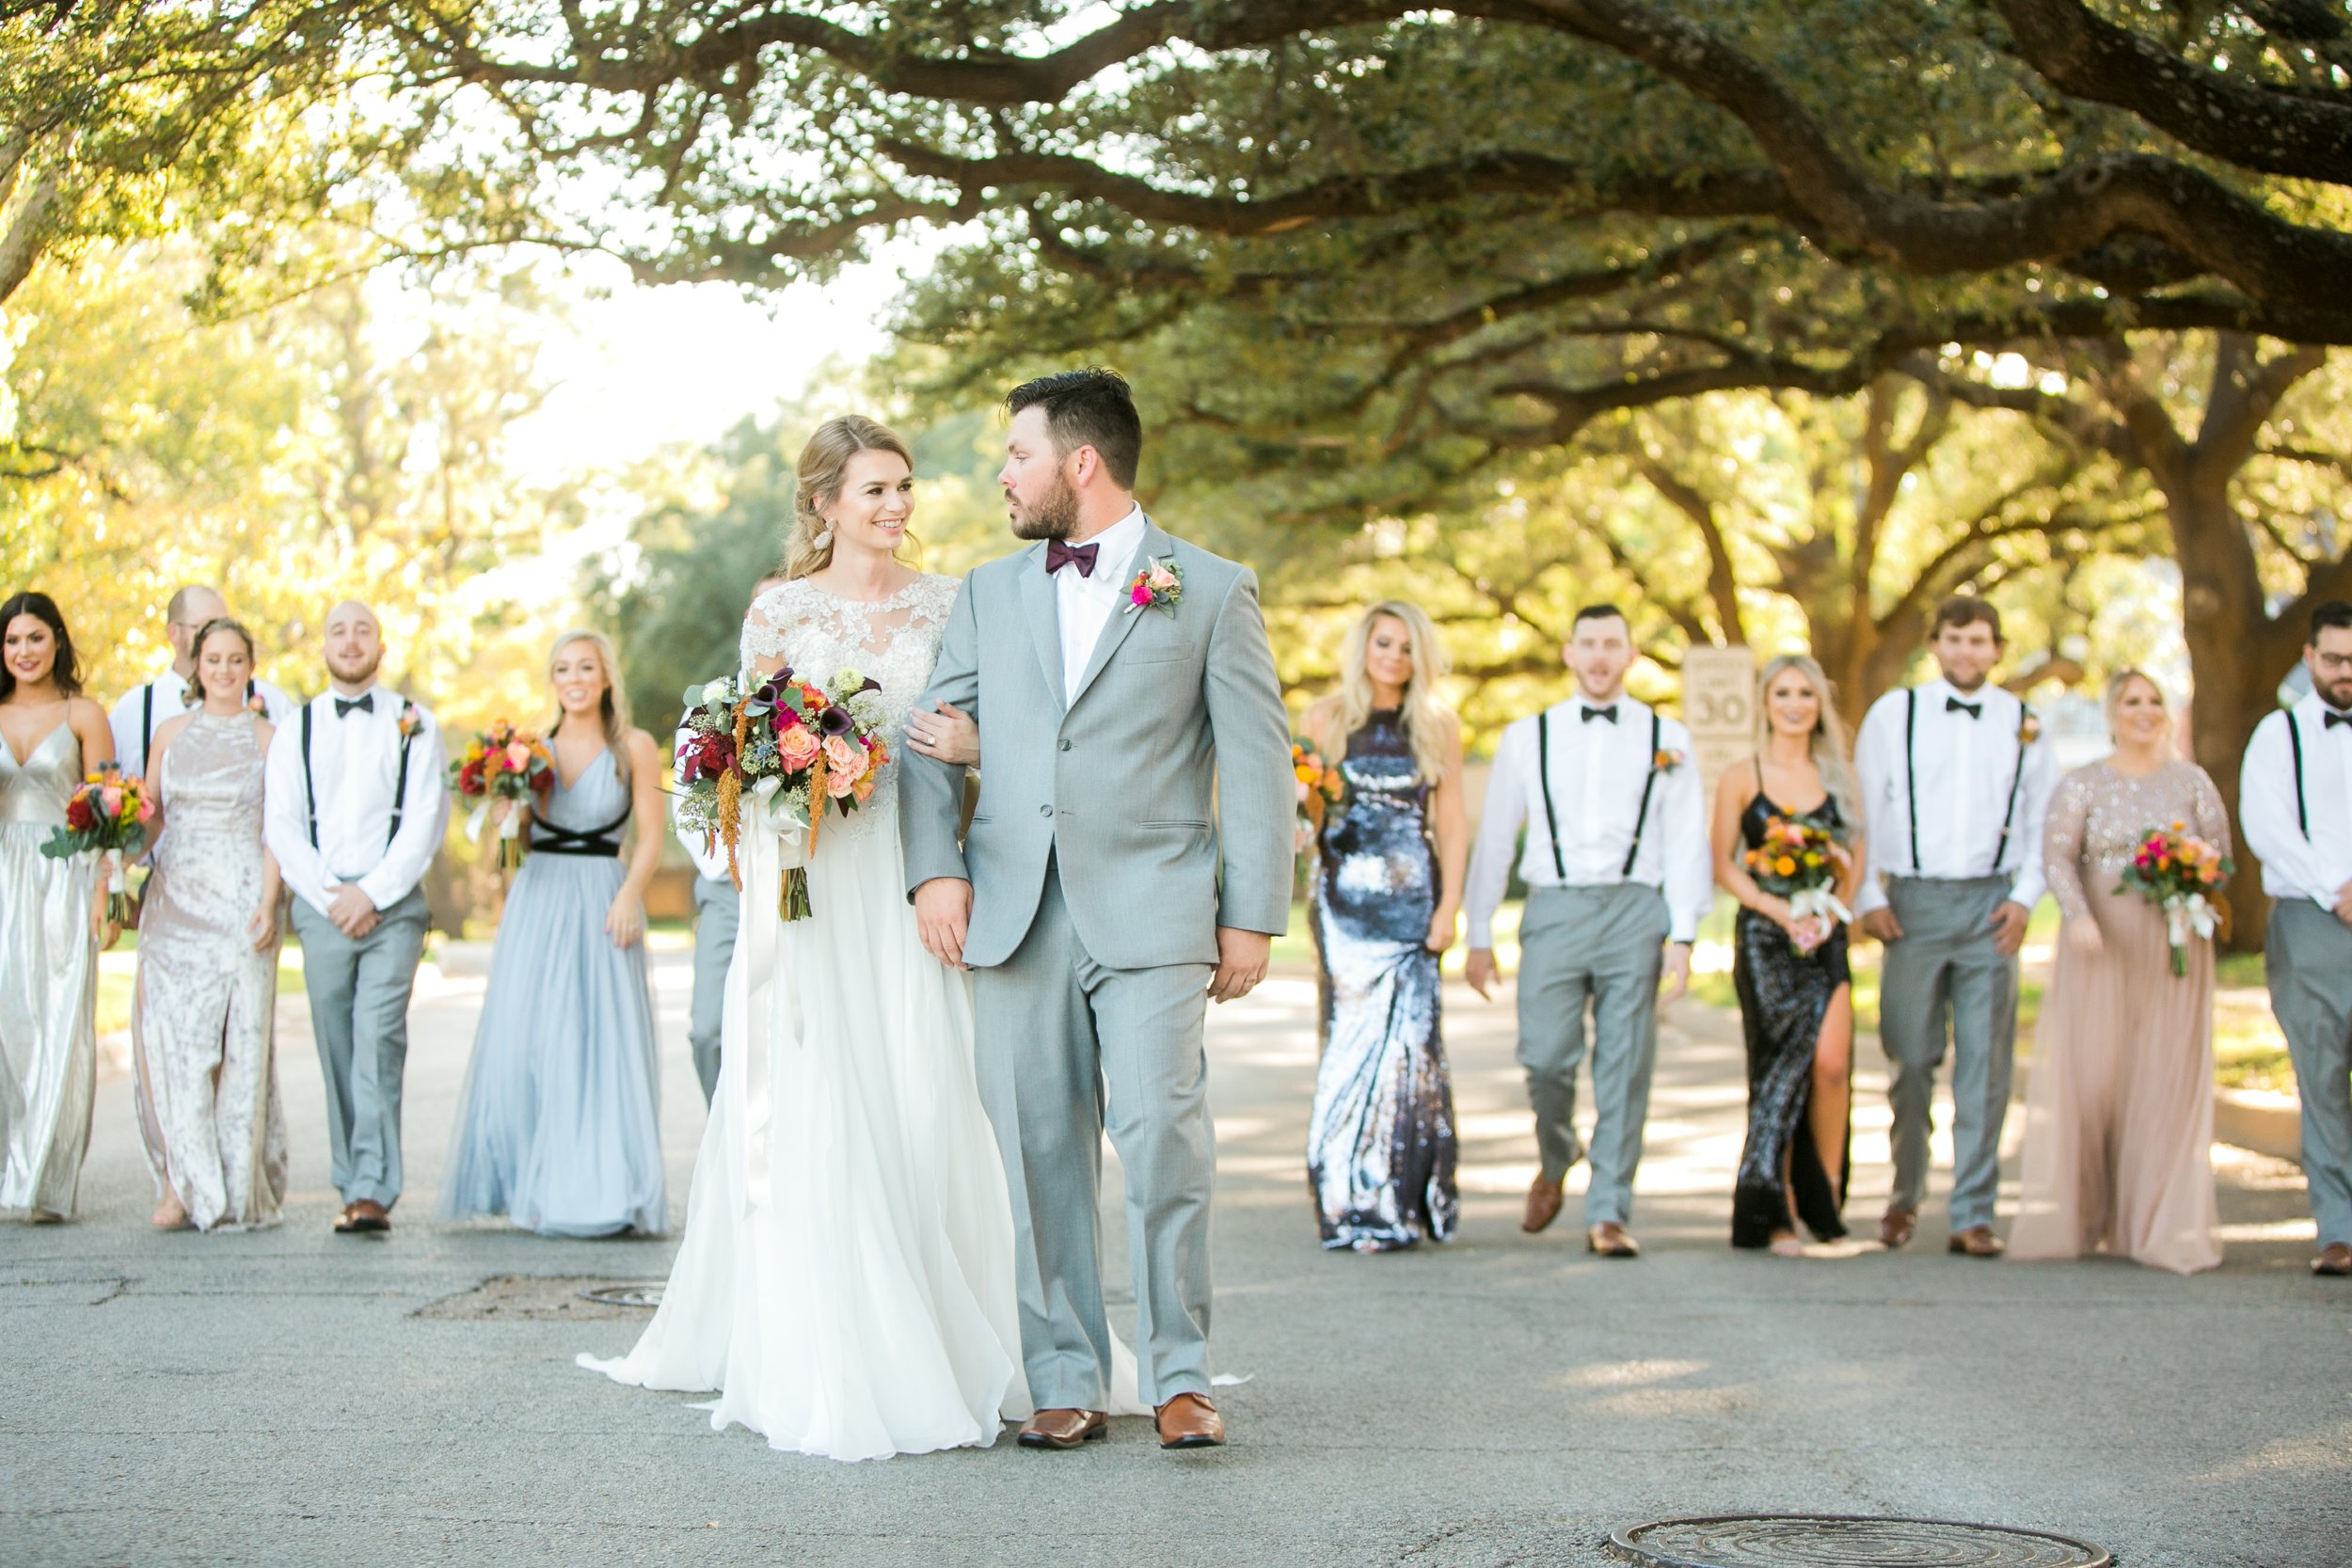 Roberson-Wedding-The-Forum-Lauren-Pinson-Wedding-Photography-Wichita-Falls-Texas-064.jpg